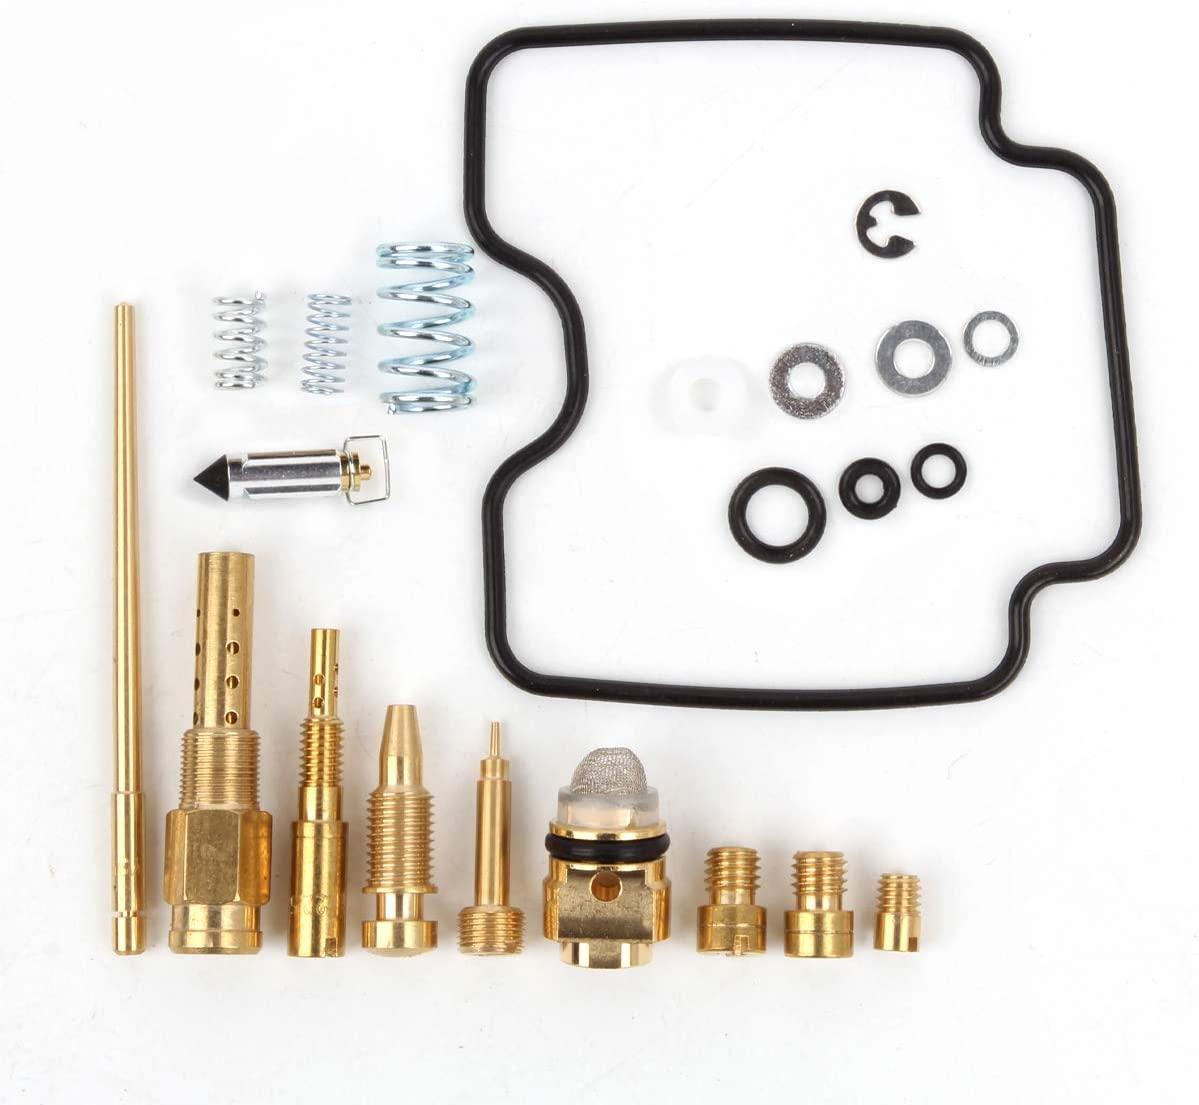 Carburetor Repair Carb Rebuild Kit for LTZ400 Quadsport Z400 2003 2004 2005 2006 2007 2008